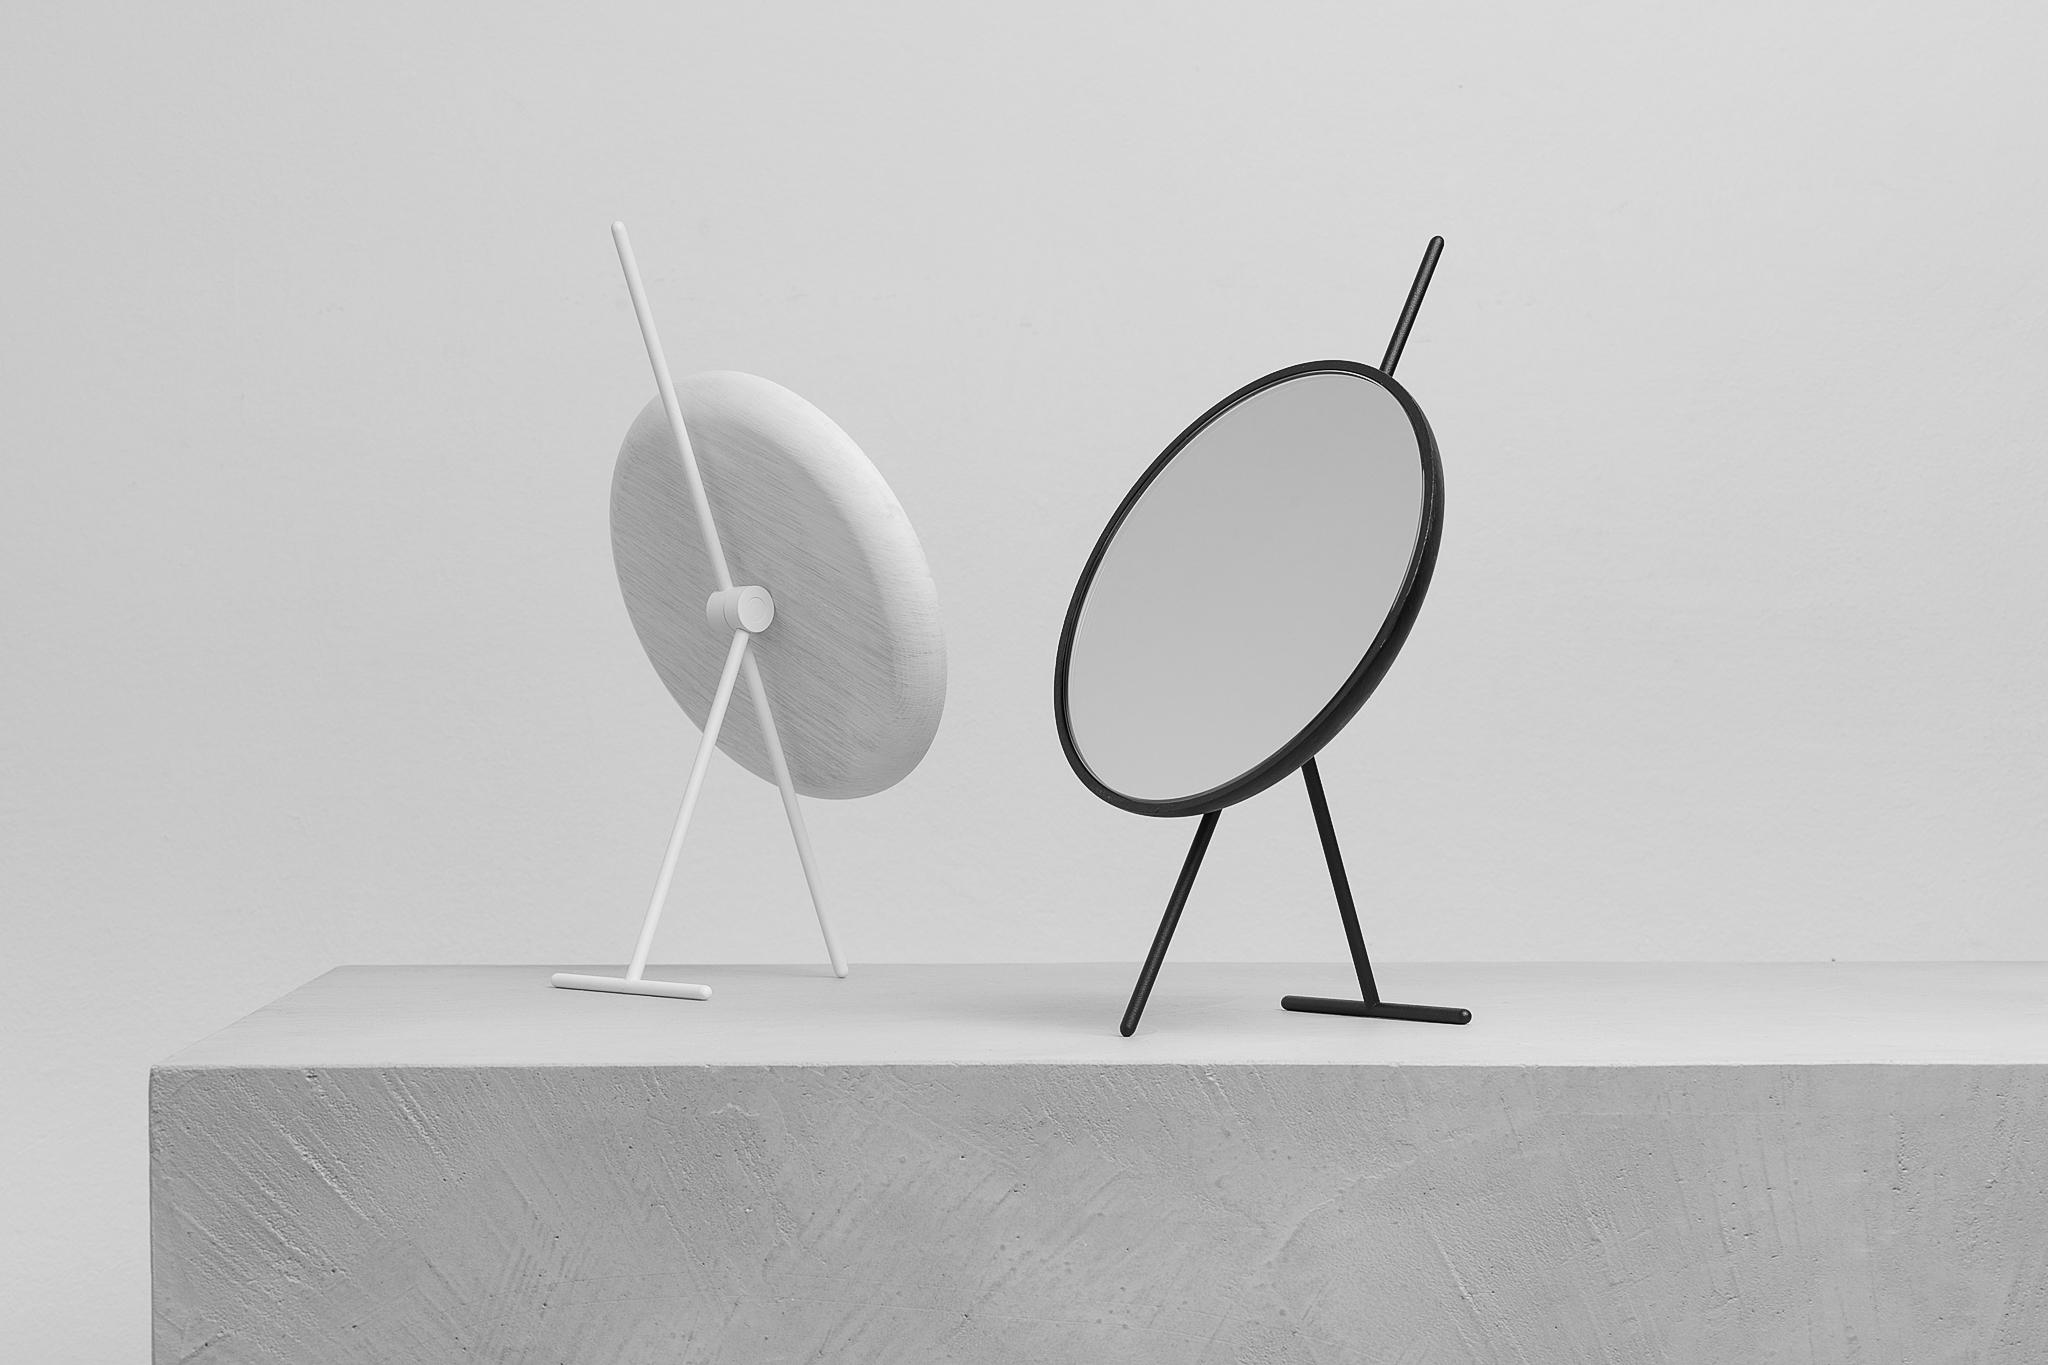 1.0 Mirror - designed by Regular Company__photo Gasparovic _ Dugandzic - 4.jpg